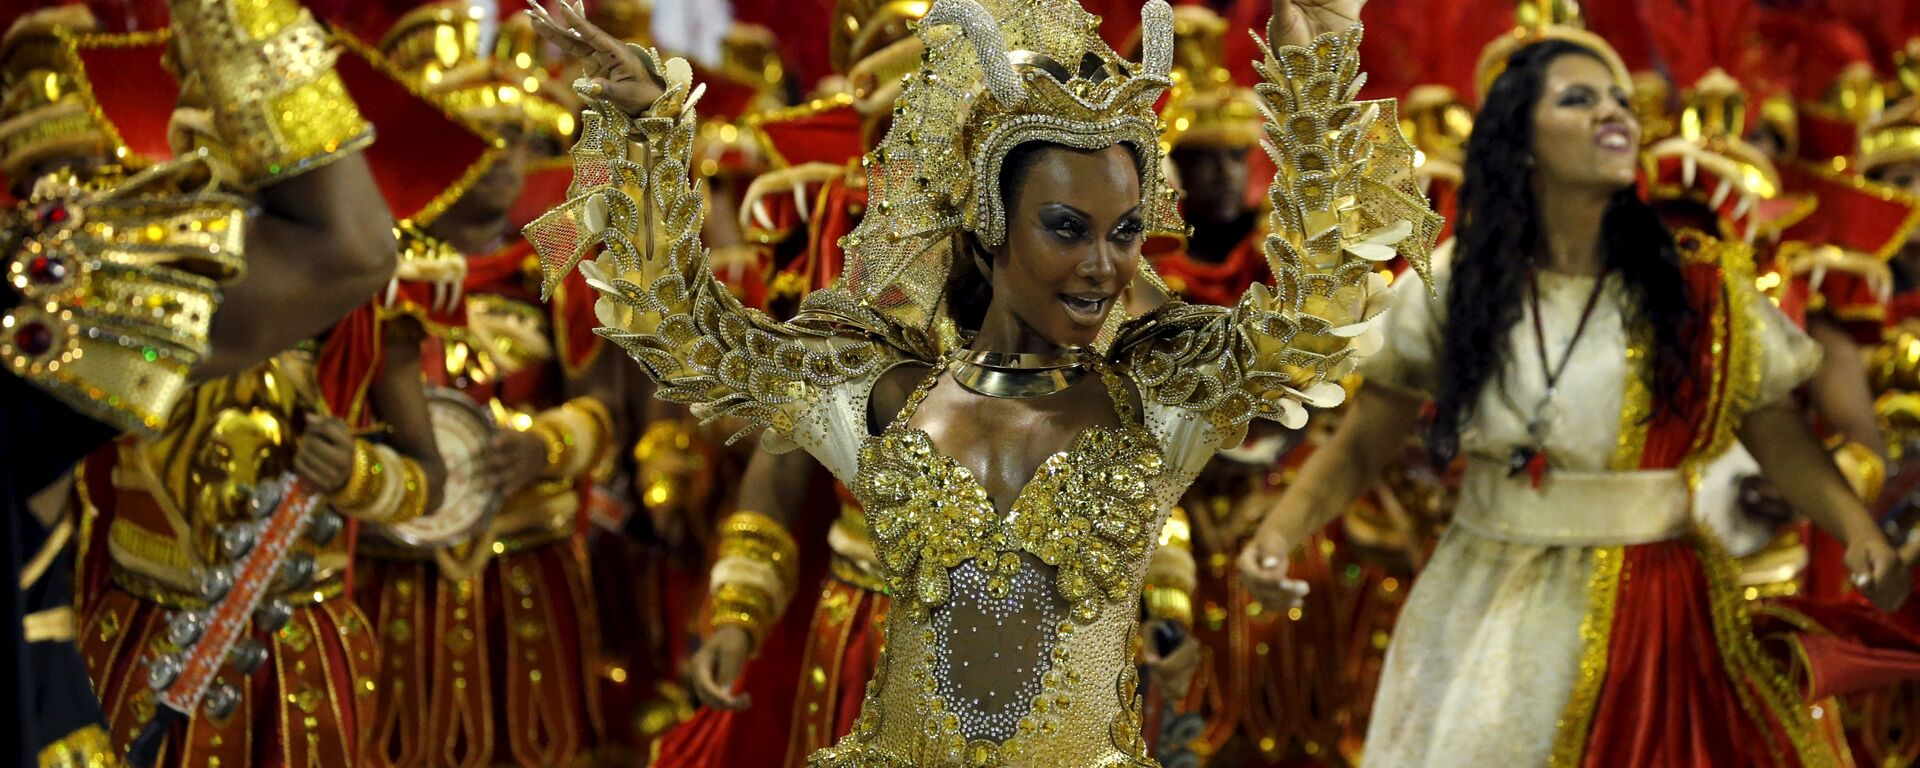 Estacio de Sa samba schooll's Drum Queen Luana Bandeira performs during the carnaval parade at the Sambadrome in Rio de Janeiro's Sambadrome February 7, 2016. - Sputnik Mundo, 1920, 04.10.2021